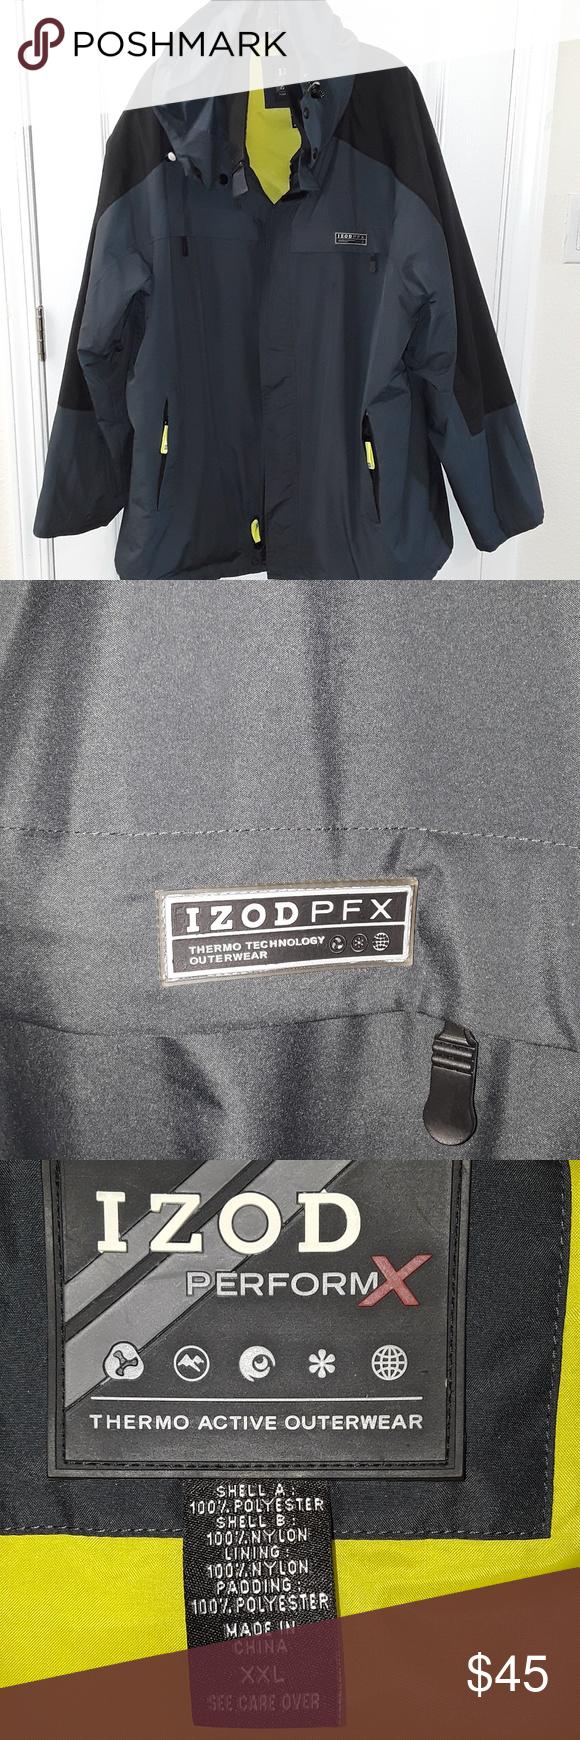 Izod Performx Hooded Jacket Hooded Jacket Outwear Jackets Jackets [ 1740 x 580 Pixel ]